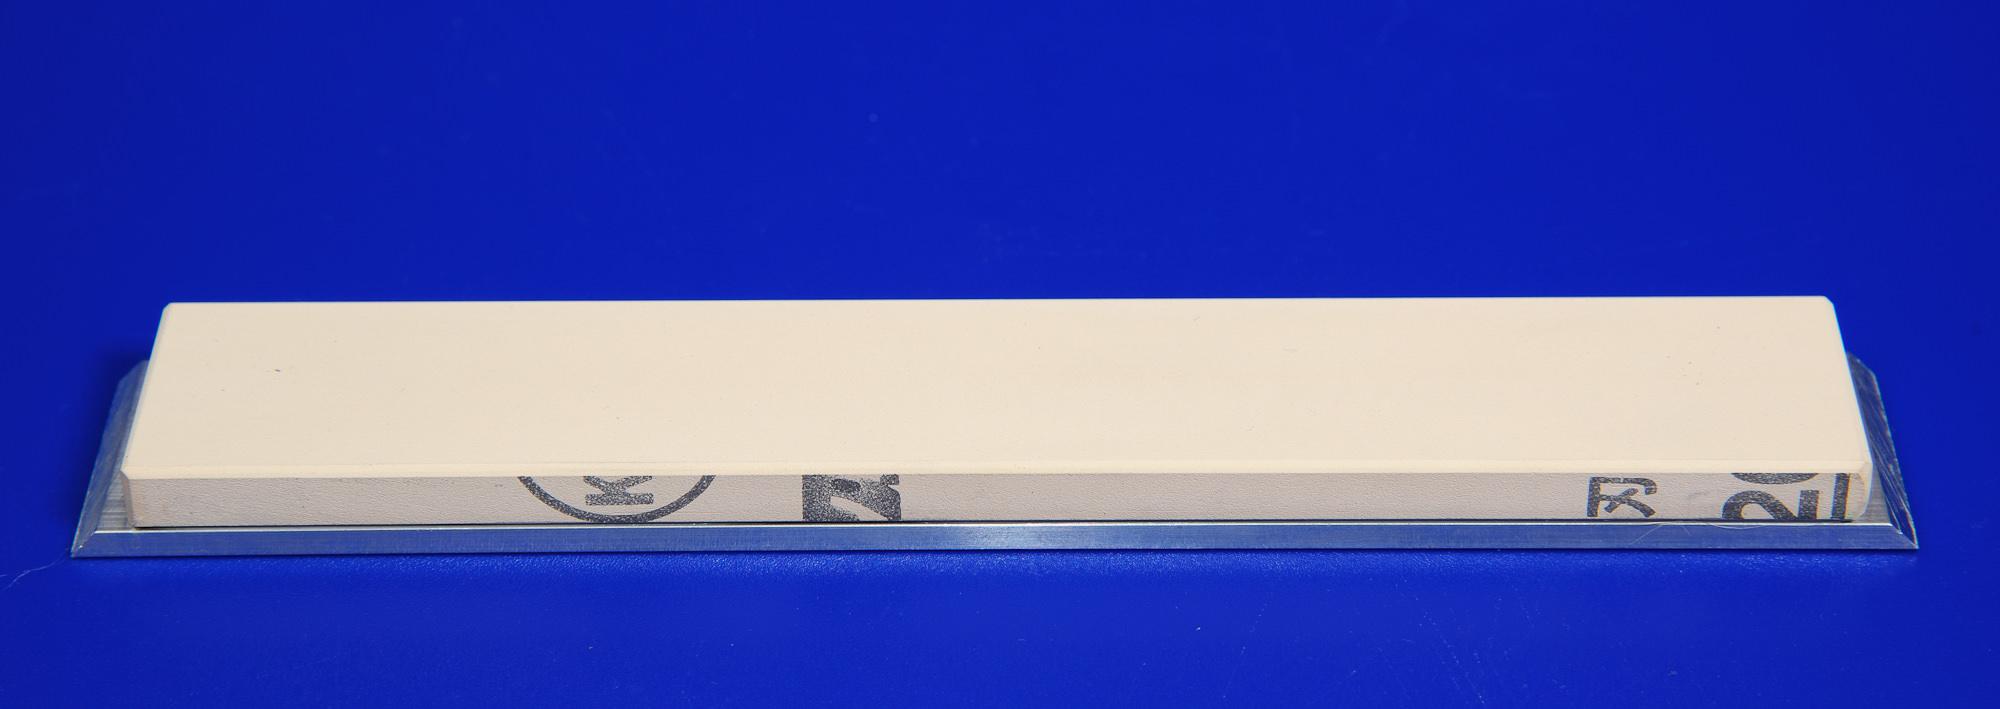 King Hyper 2000 Regular Type точильный камень